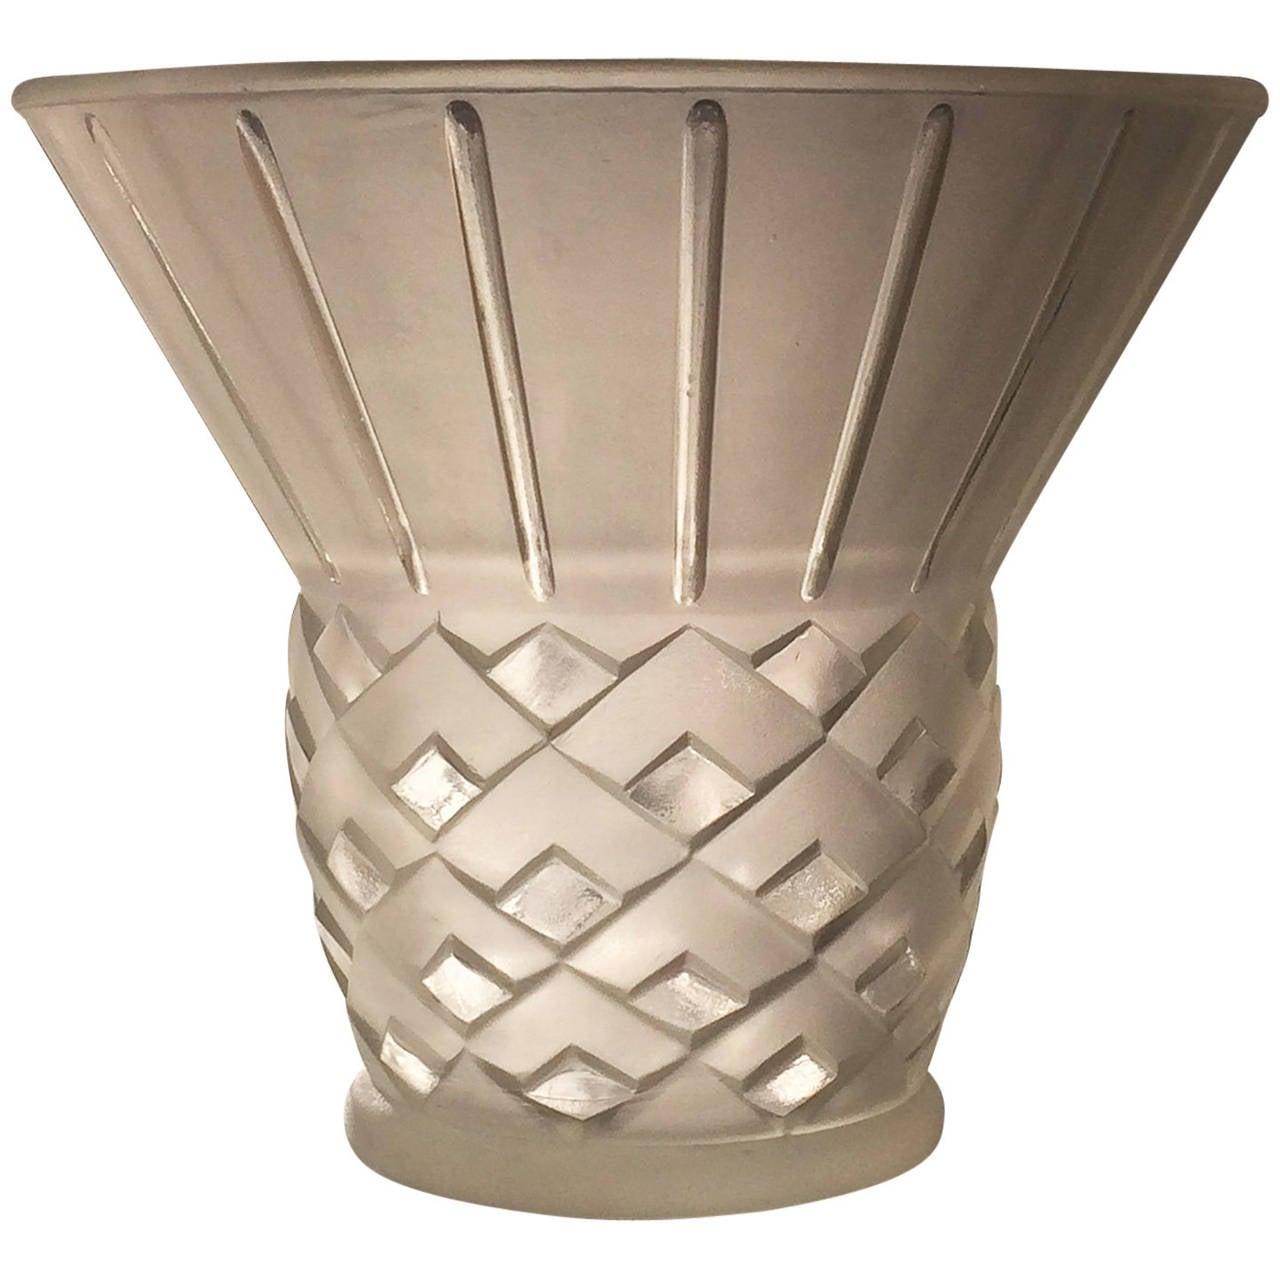 art deco french pillow vase by etling for sale at 1stdibs. Black Bedroom Furniture Sets. Home Design Ideas